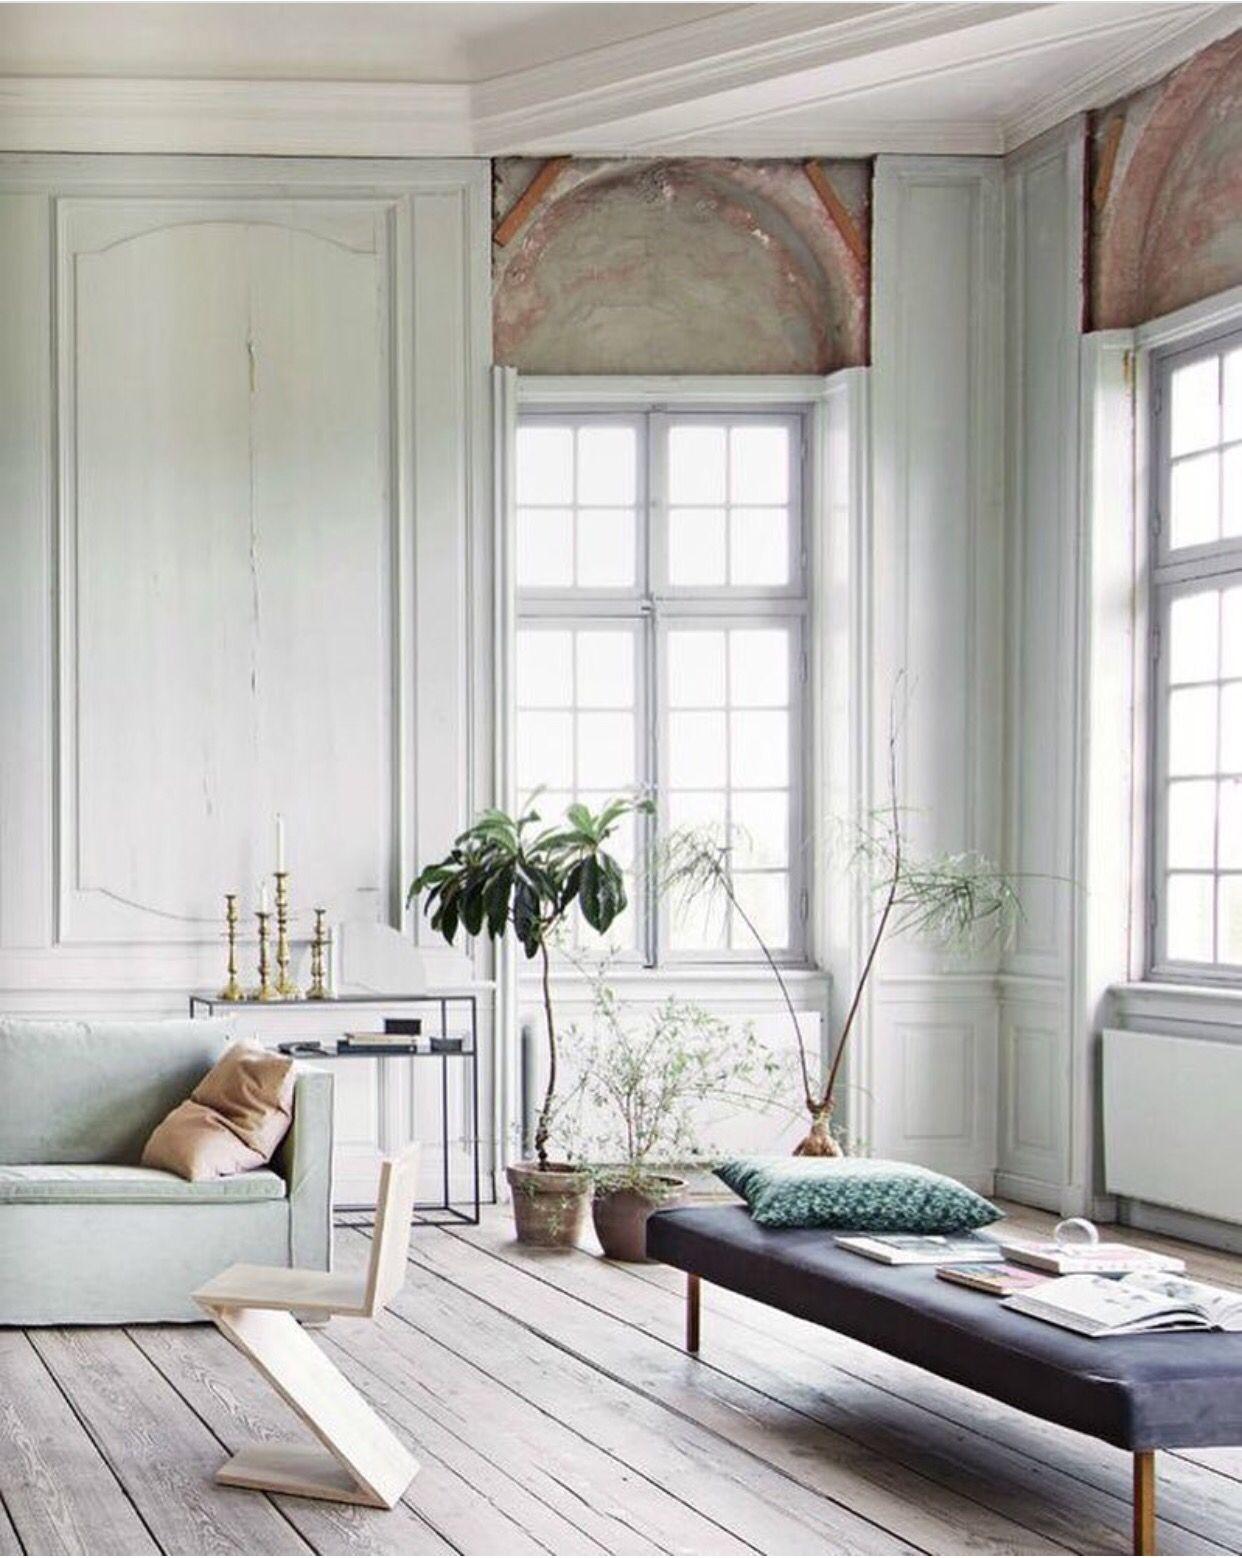 Pin by Shirin Arbee on Interior loves   Pinterest   Maison ...